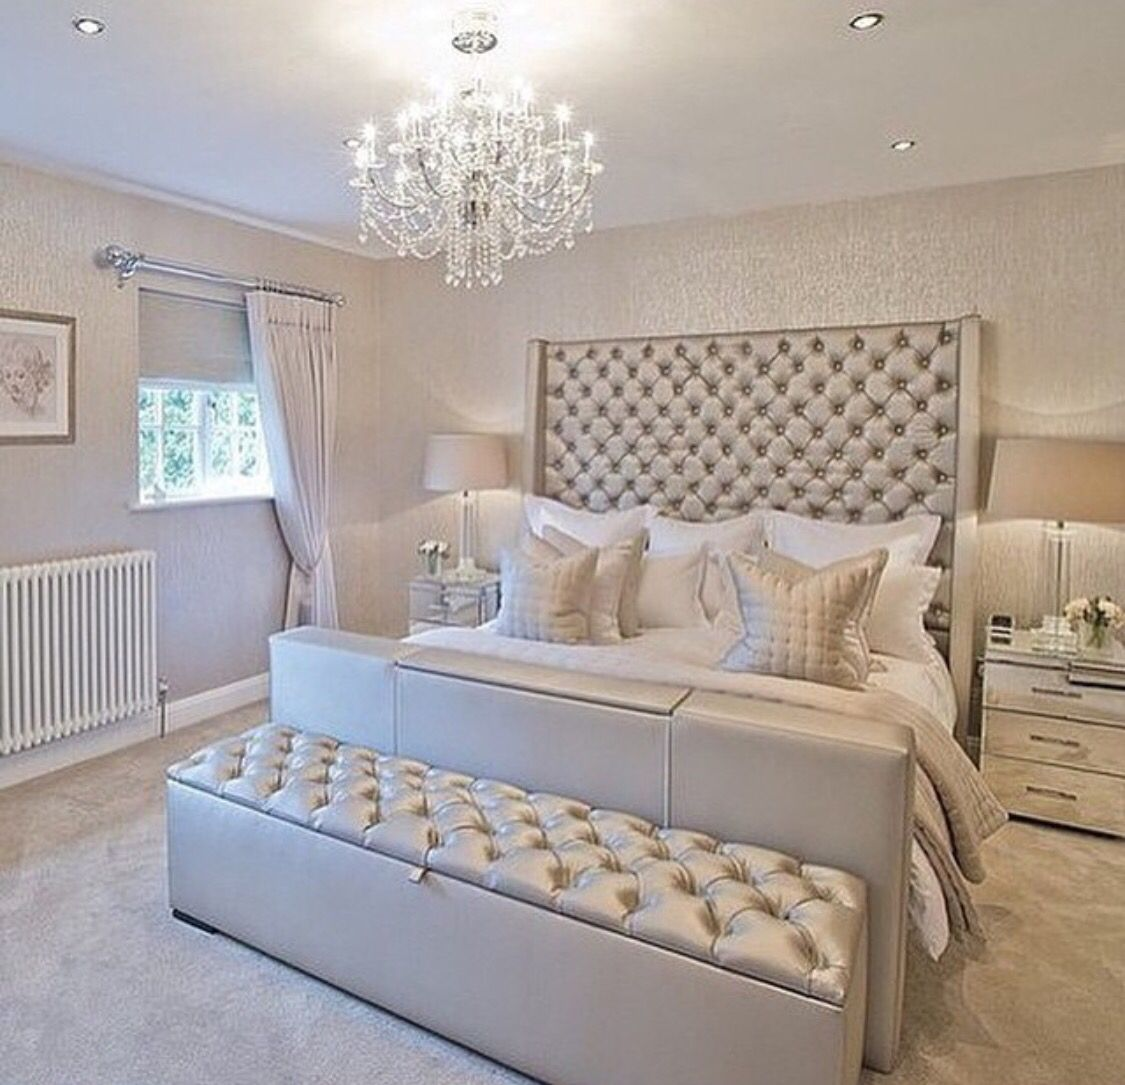 Pin by lashawn halsey on bedroom ideas pinterest bedrooms